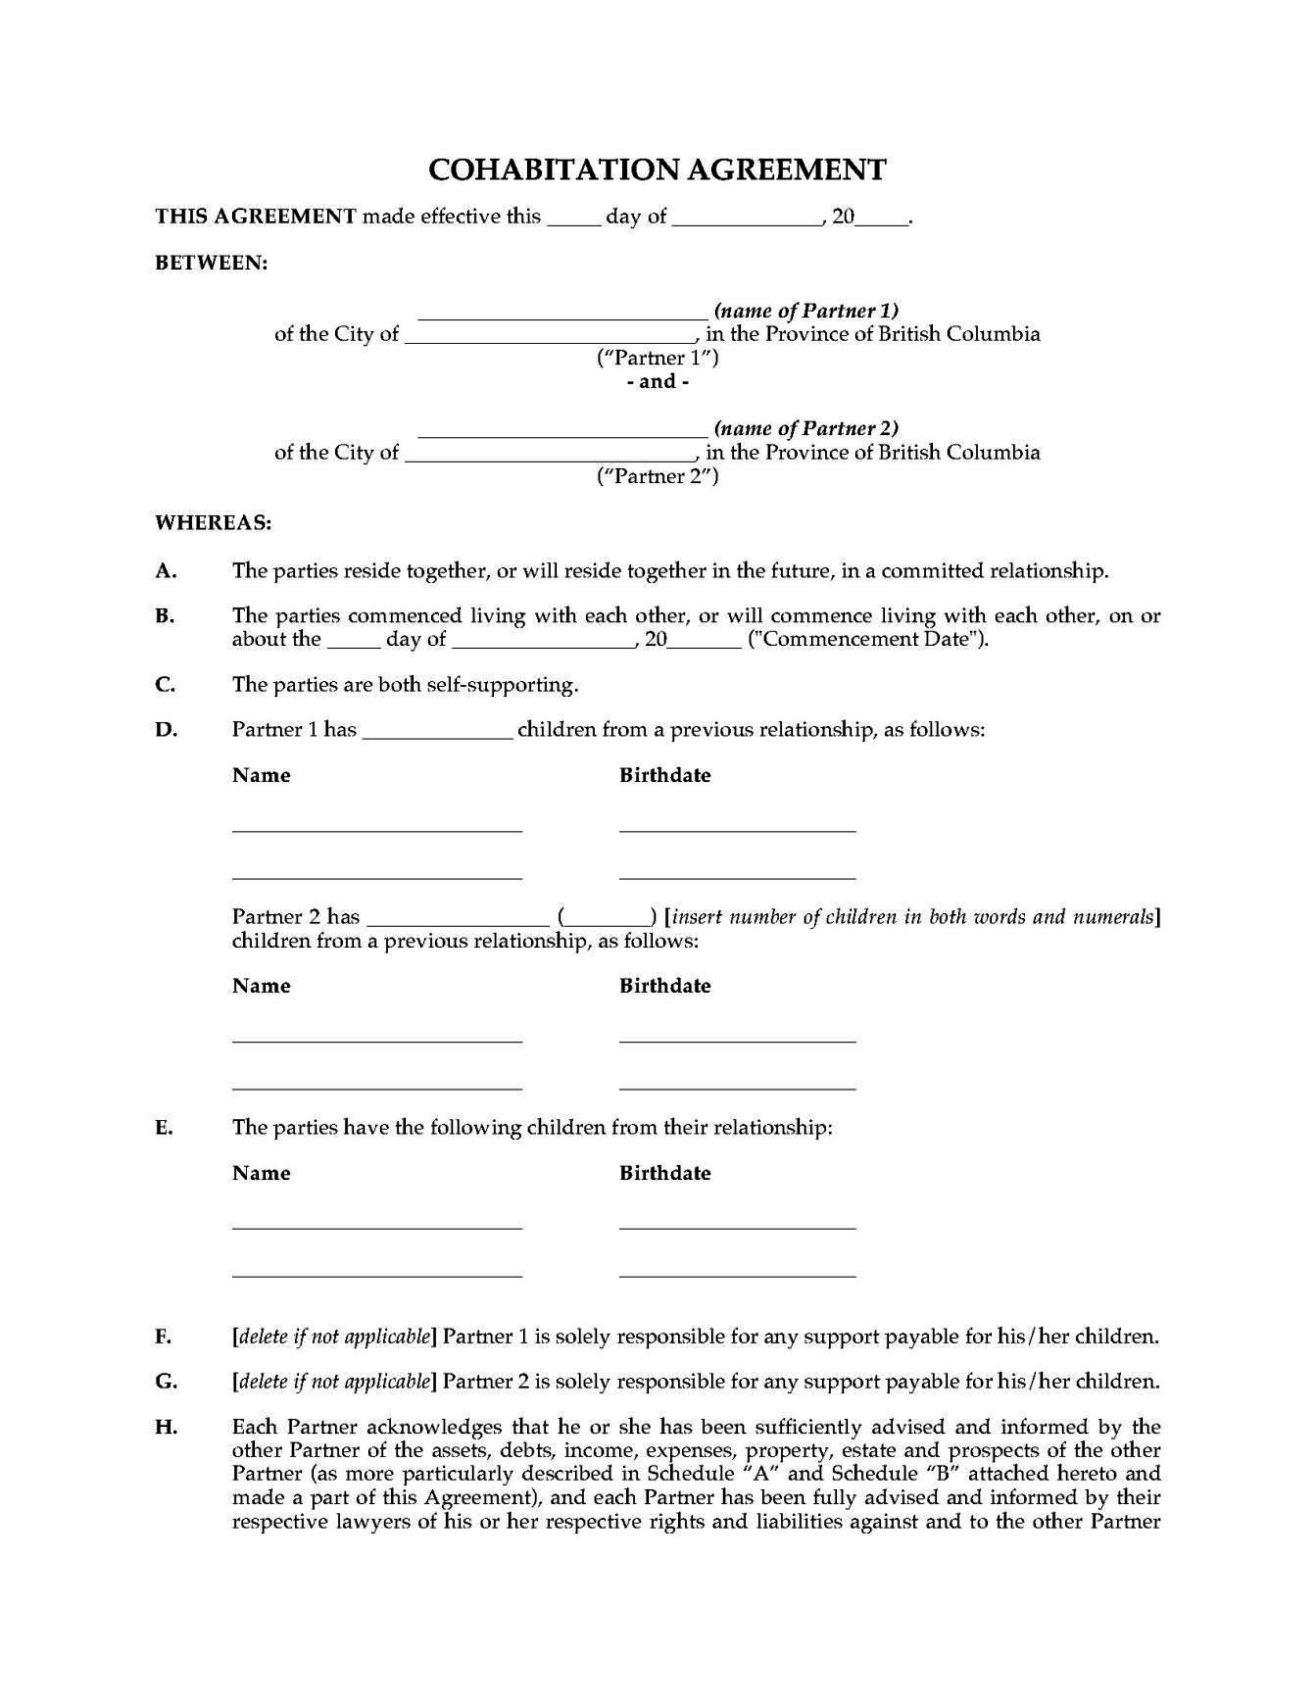 Free Cohabitation Agreement Template Sampletemplatess